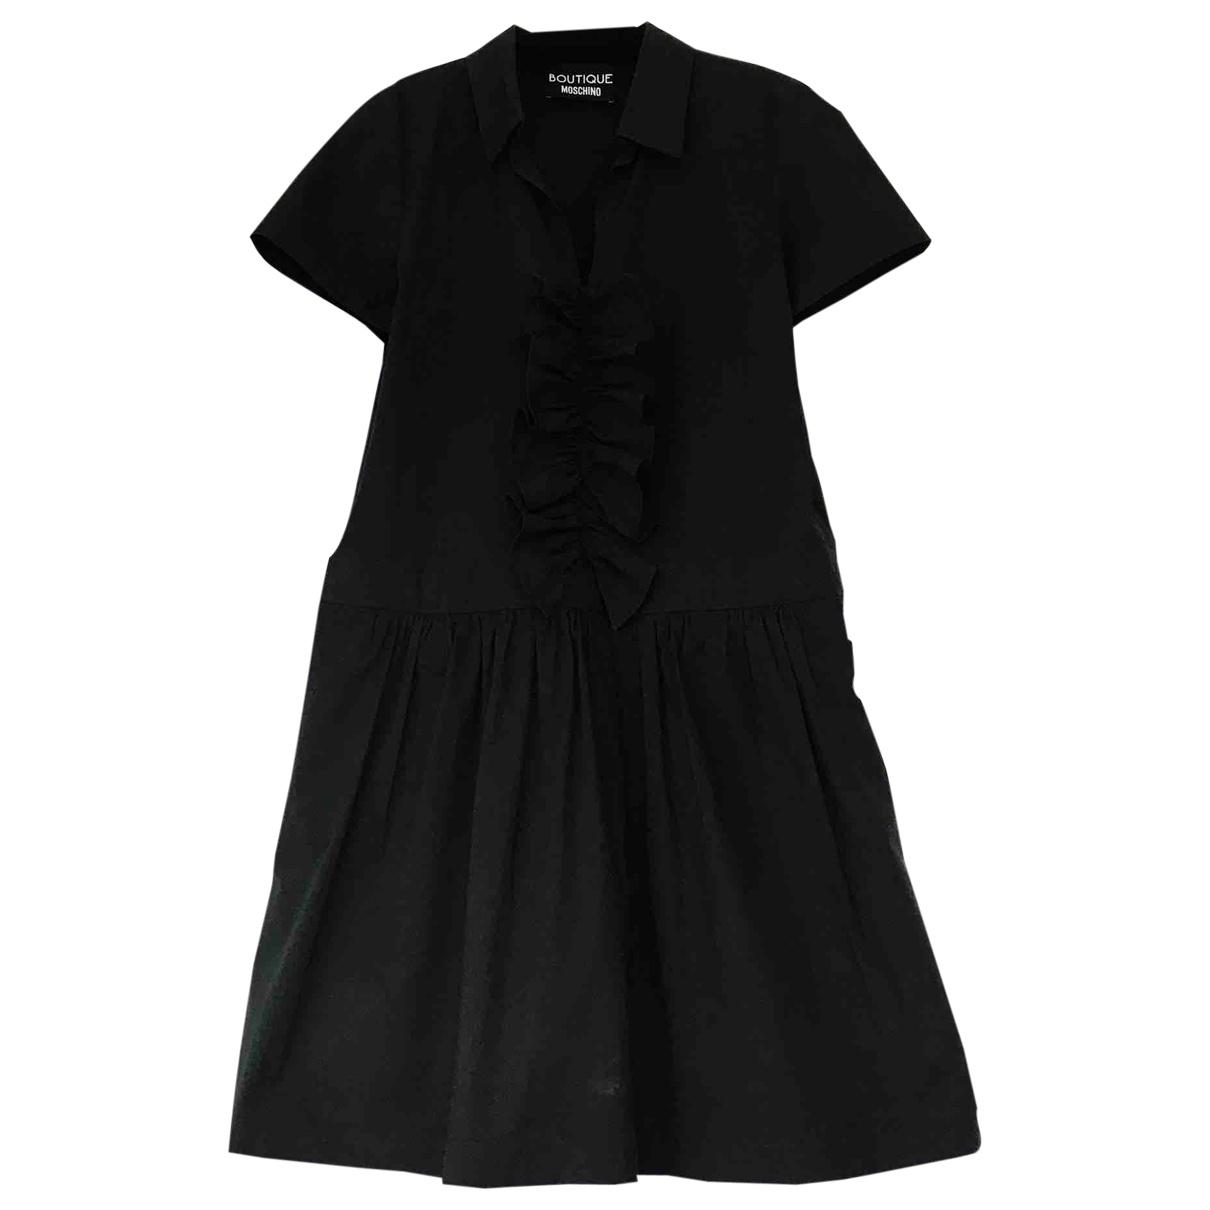 Moschino \N Black Cotton - elasthane dress for Women 46 IT